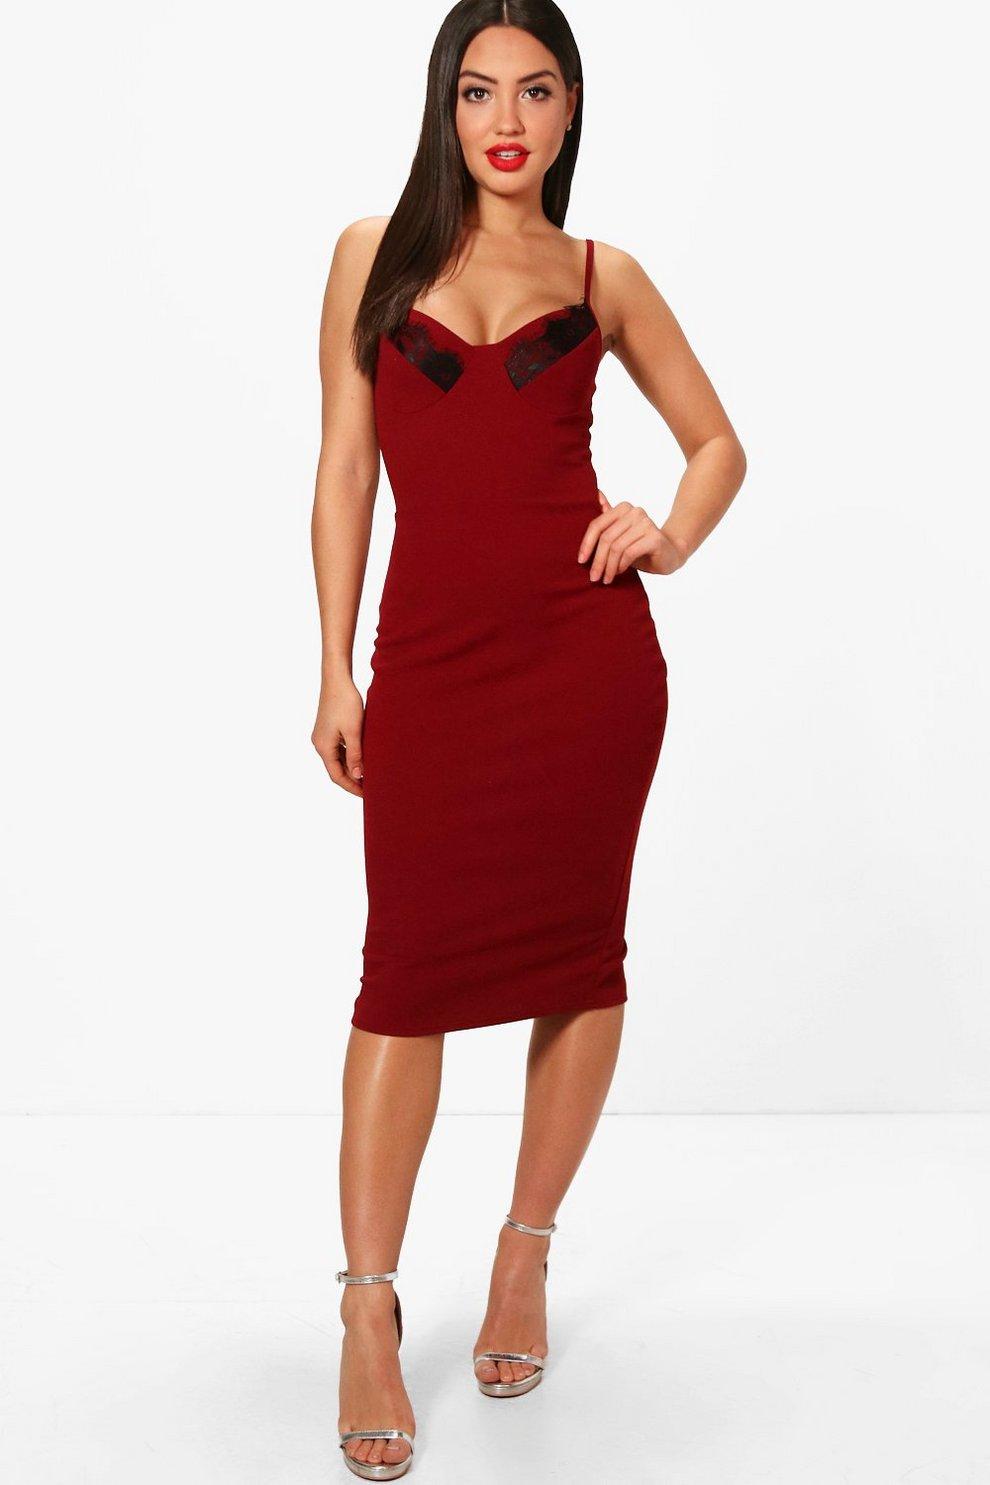 a62655bb402 Lace Cup Detail Strappy Midi Dress